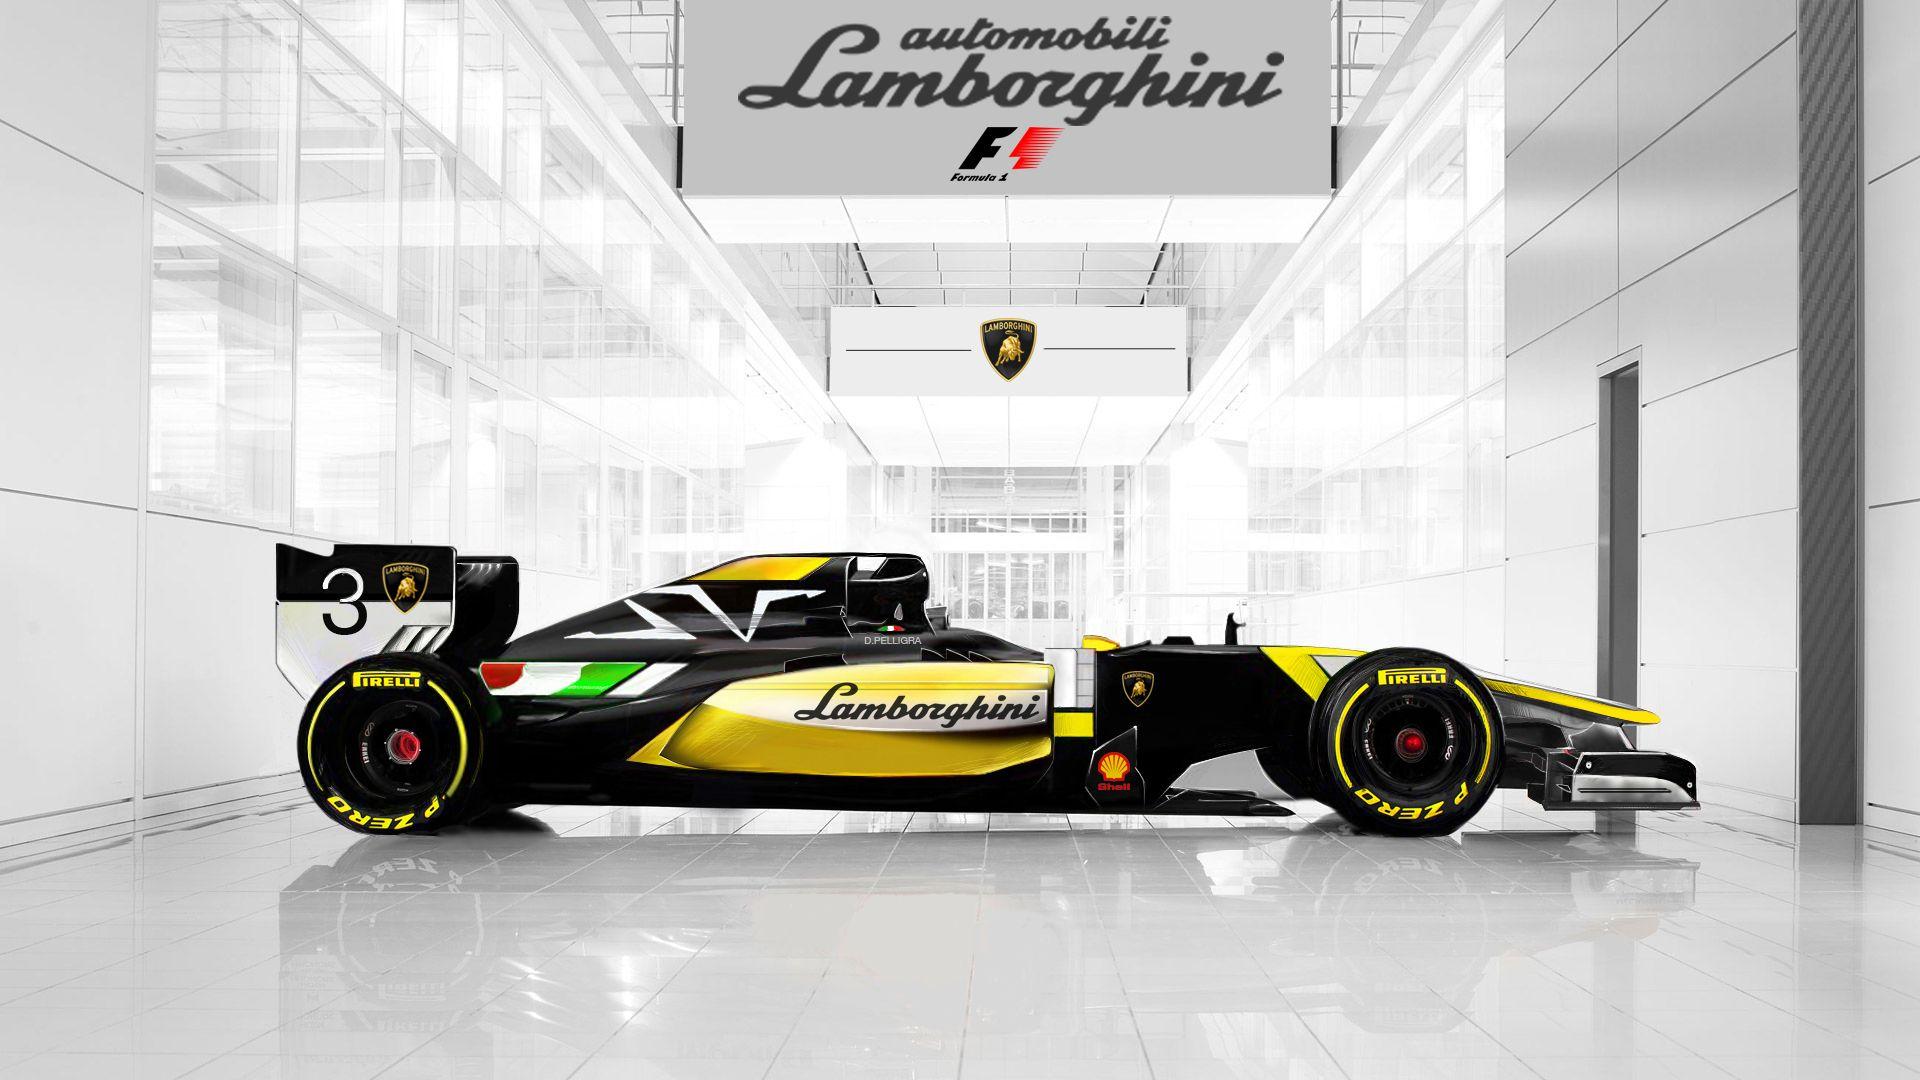 Lamborghini Formula1 2014 Concept Designed By Daniele Pelligra